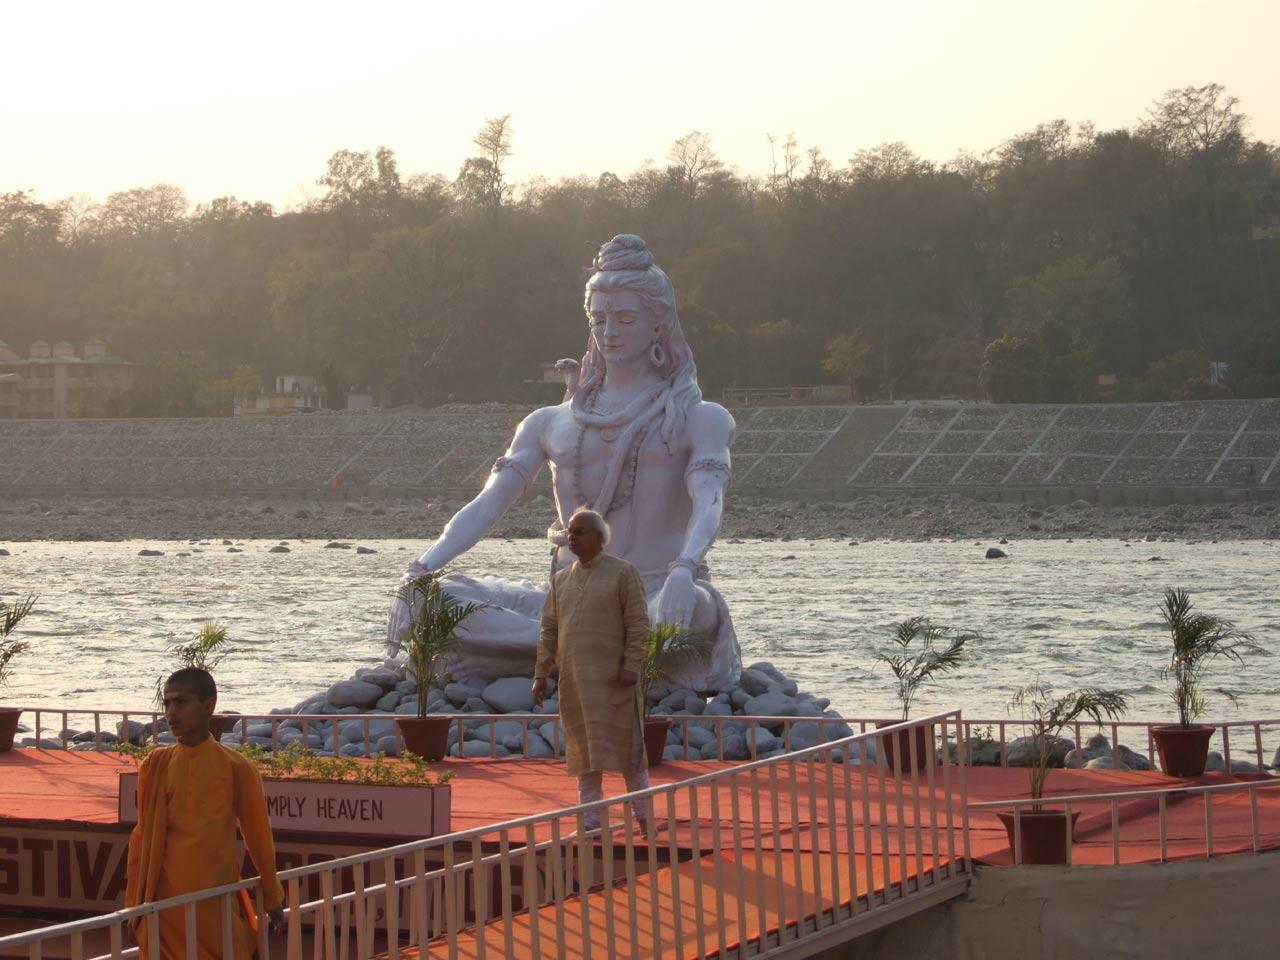 http://4.bp.blogspot.com/_39zYJ5BXAZs/TUAY43UPvbI/AAAAAAAAEHU/G8t24QapYjg/s1600/india-rishikesh.jpg